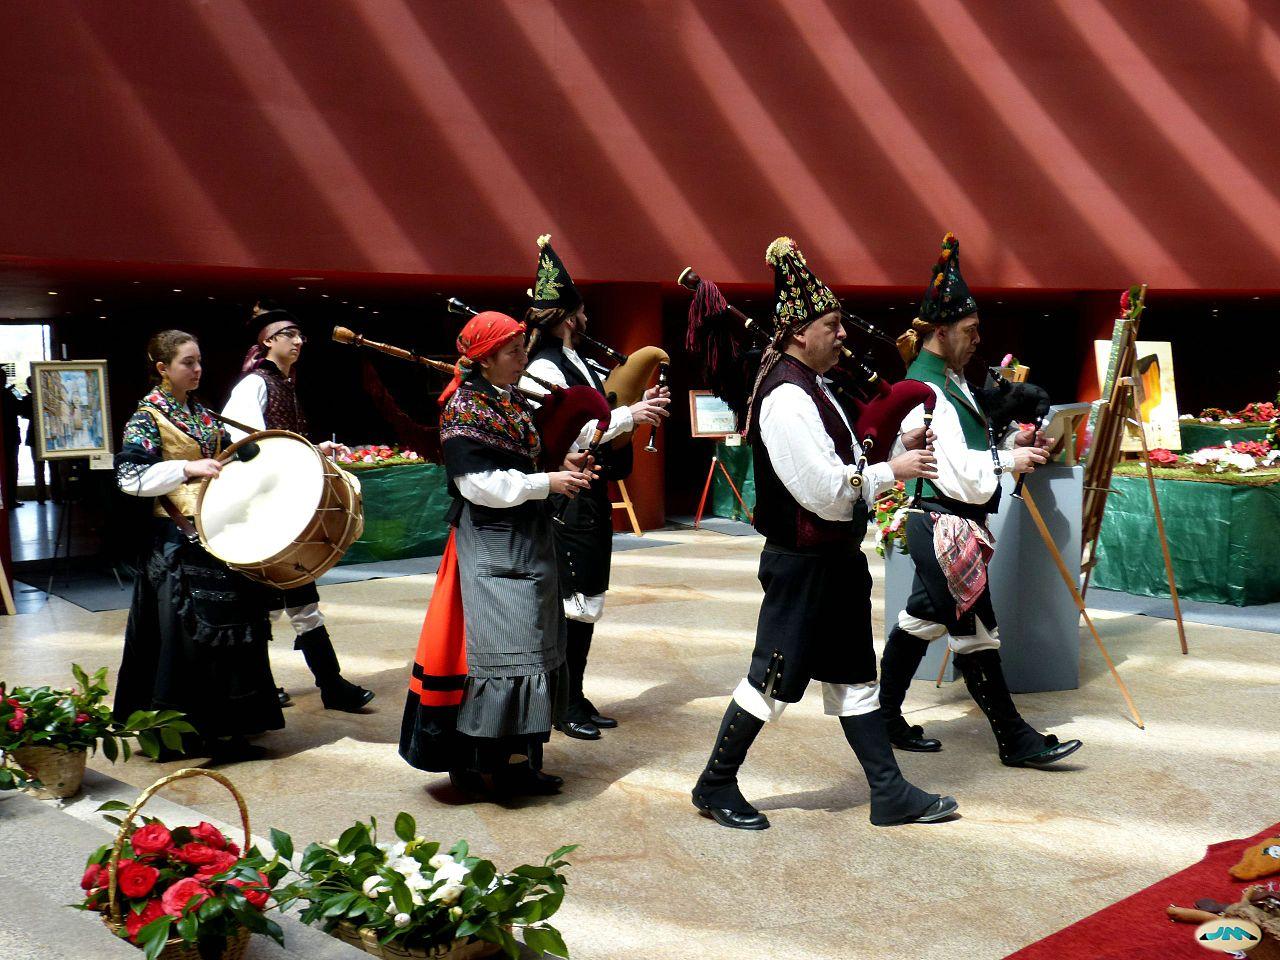 Grupo musical gallego